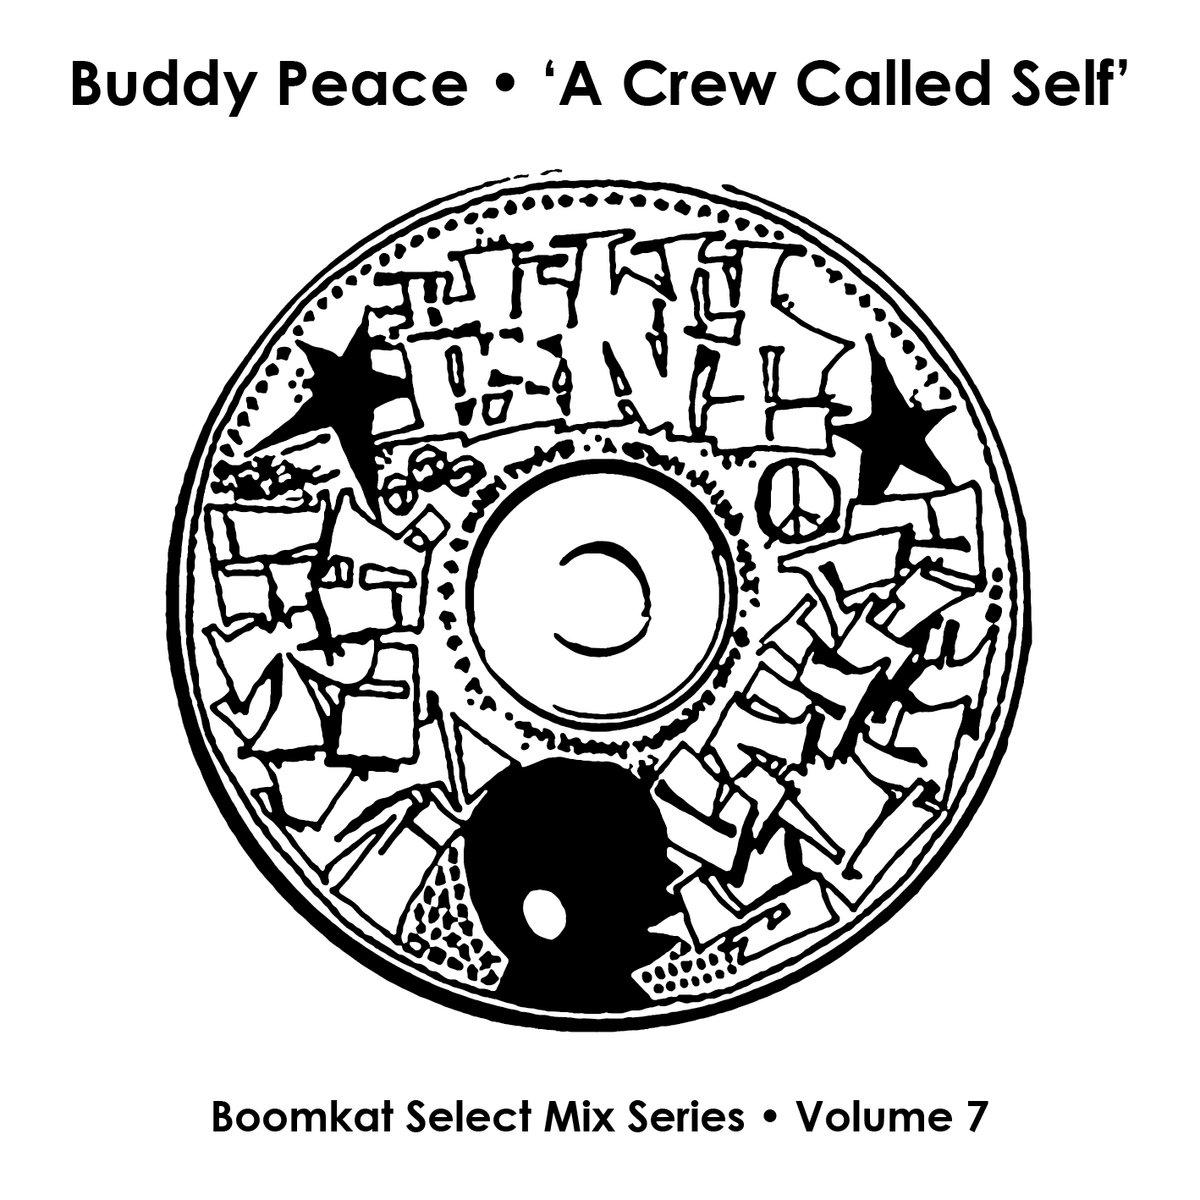 A Crew Called Self Mixtape Buddy Peace